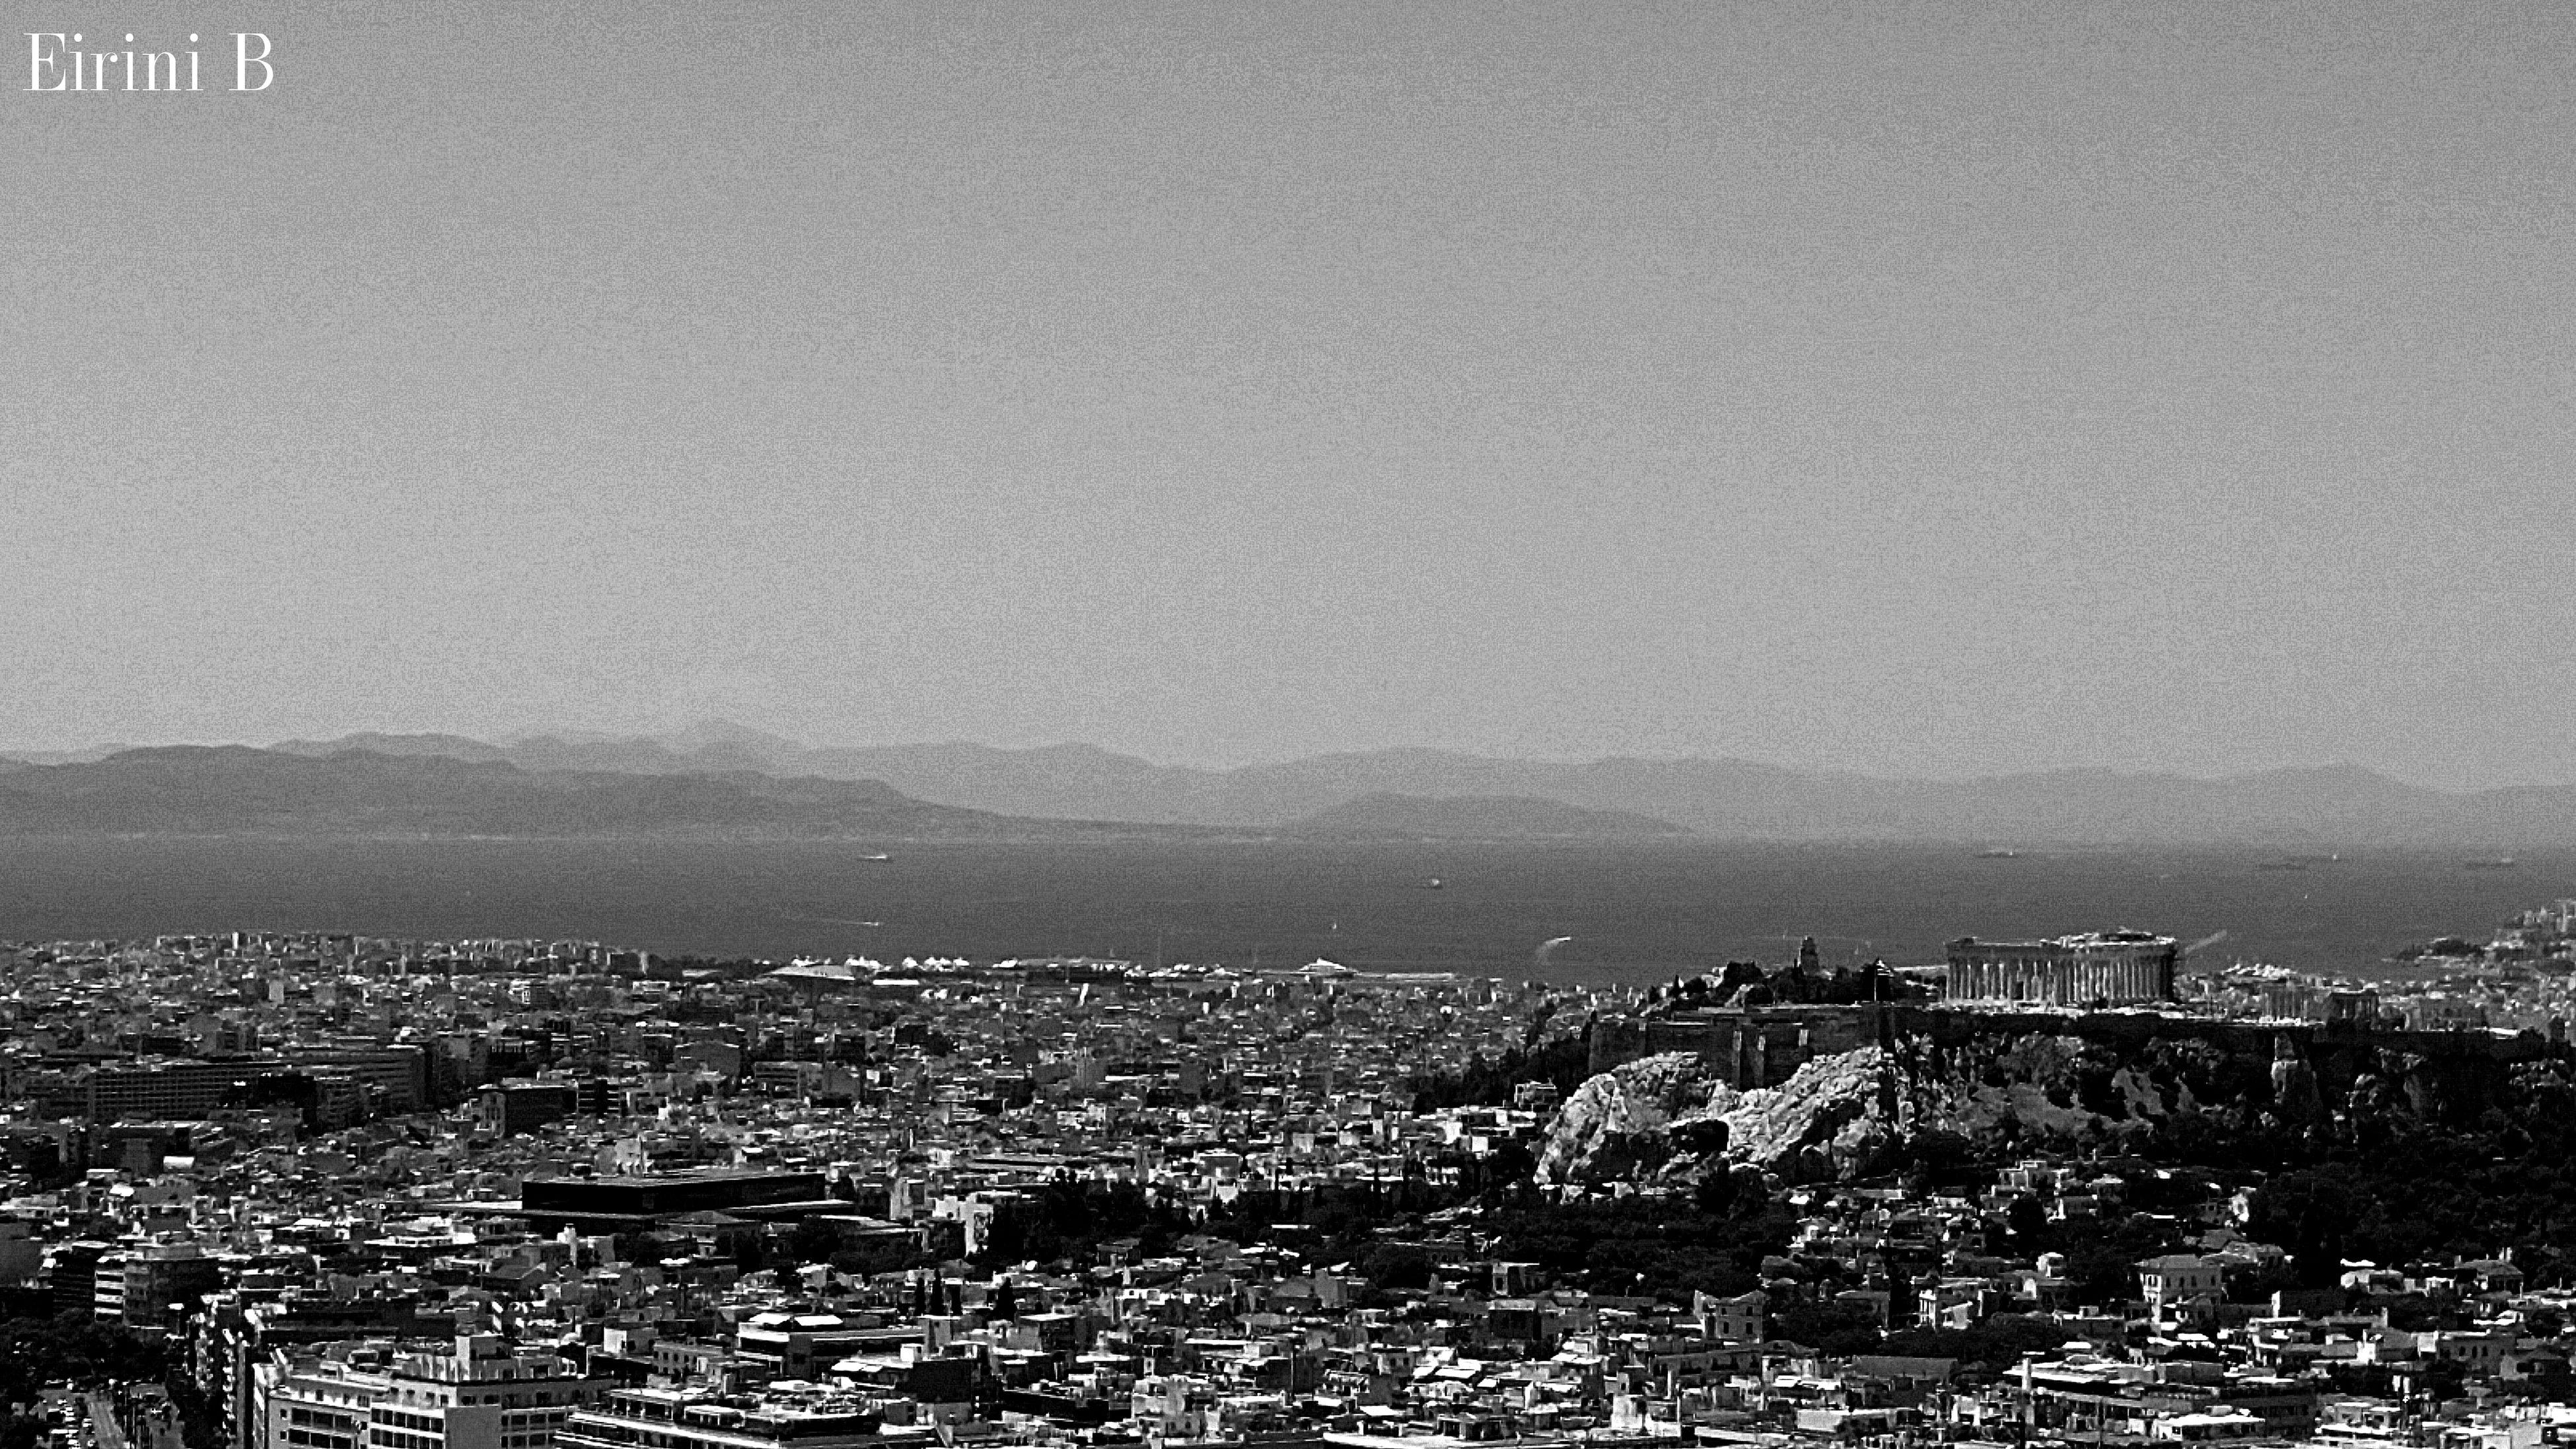 Arhens,Greece City Architecture Sky Outdoors Sea Day Cityscape Lykavitos Akropolis Mountains